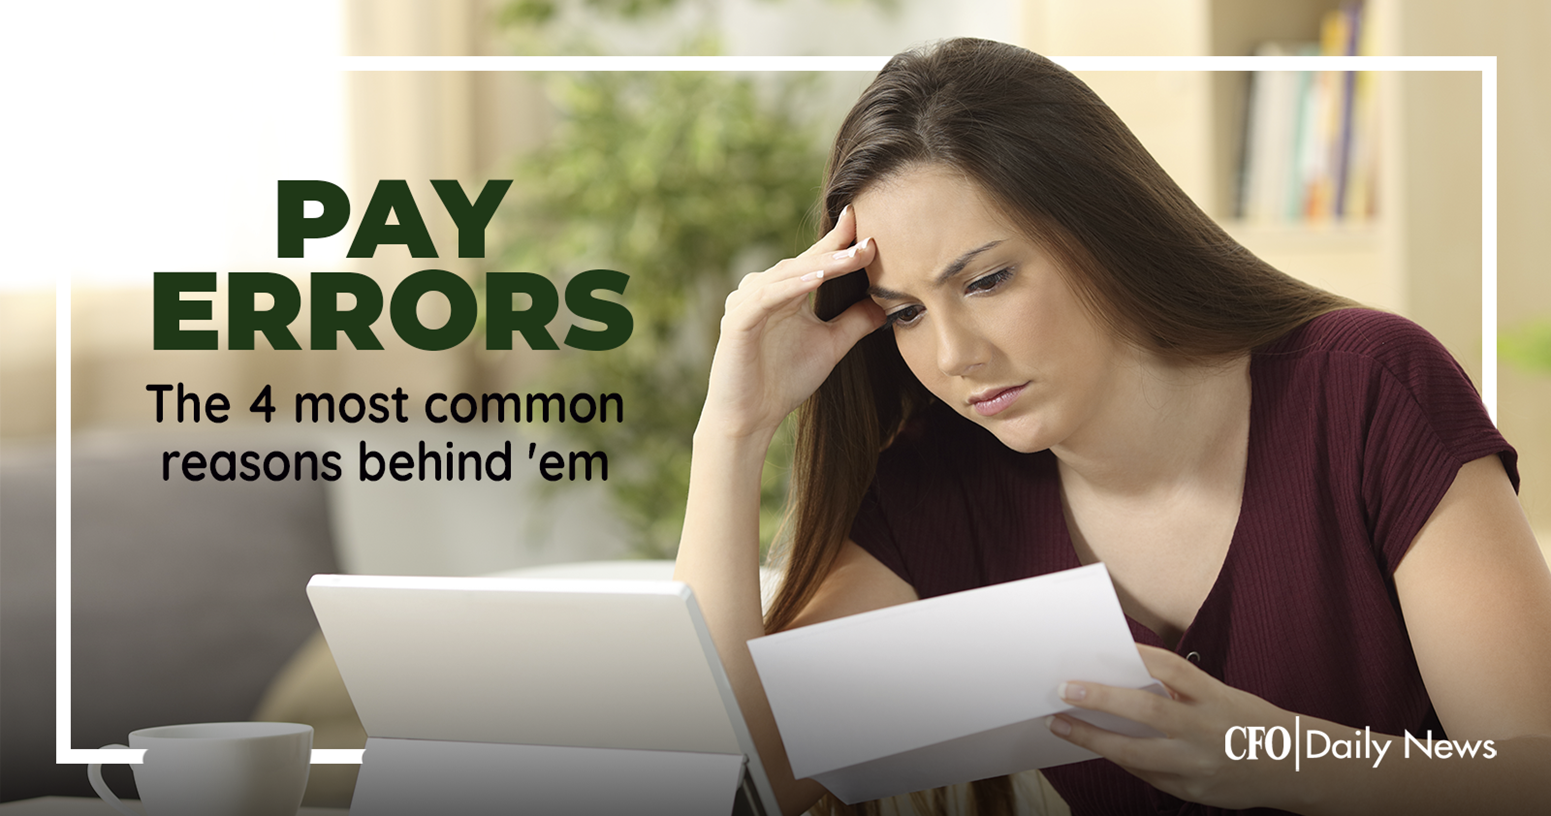 Pay errors